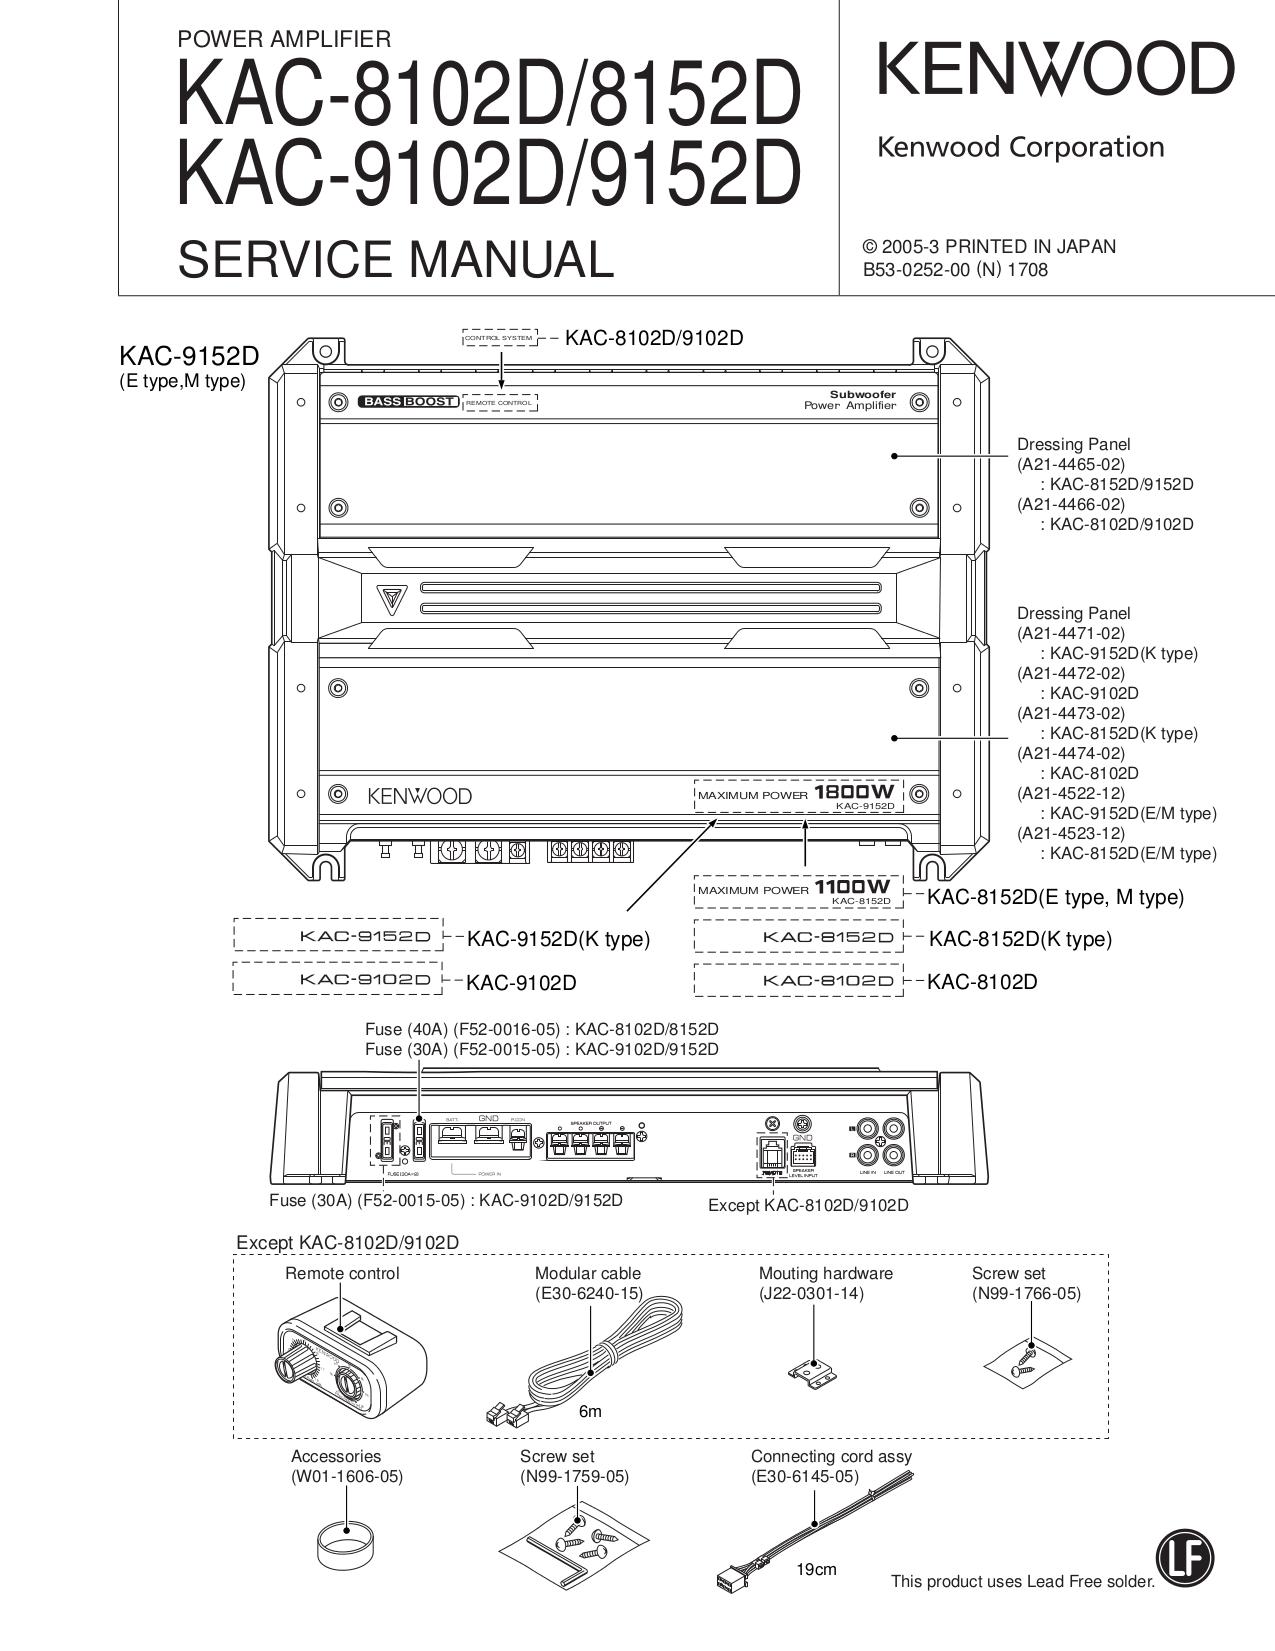 api 625 pdf free download